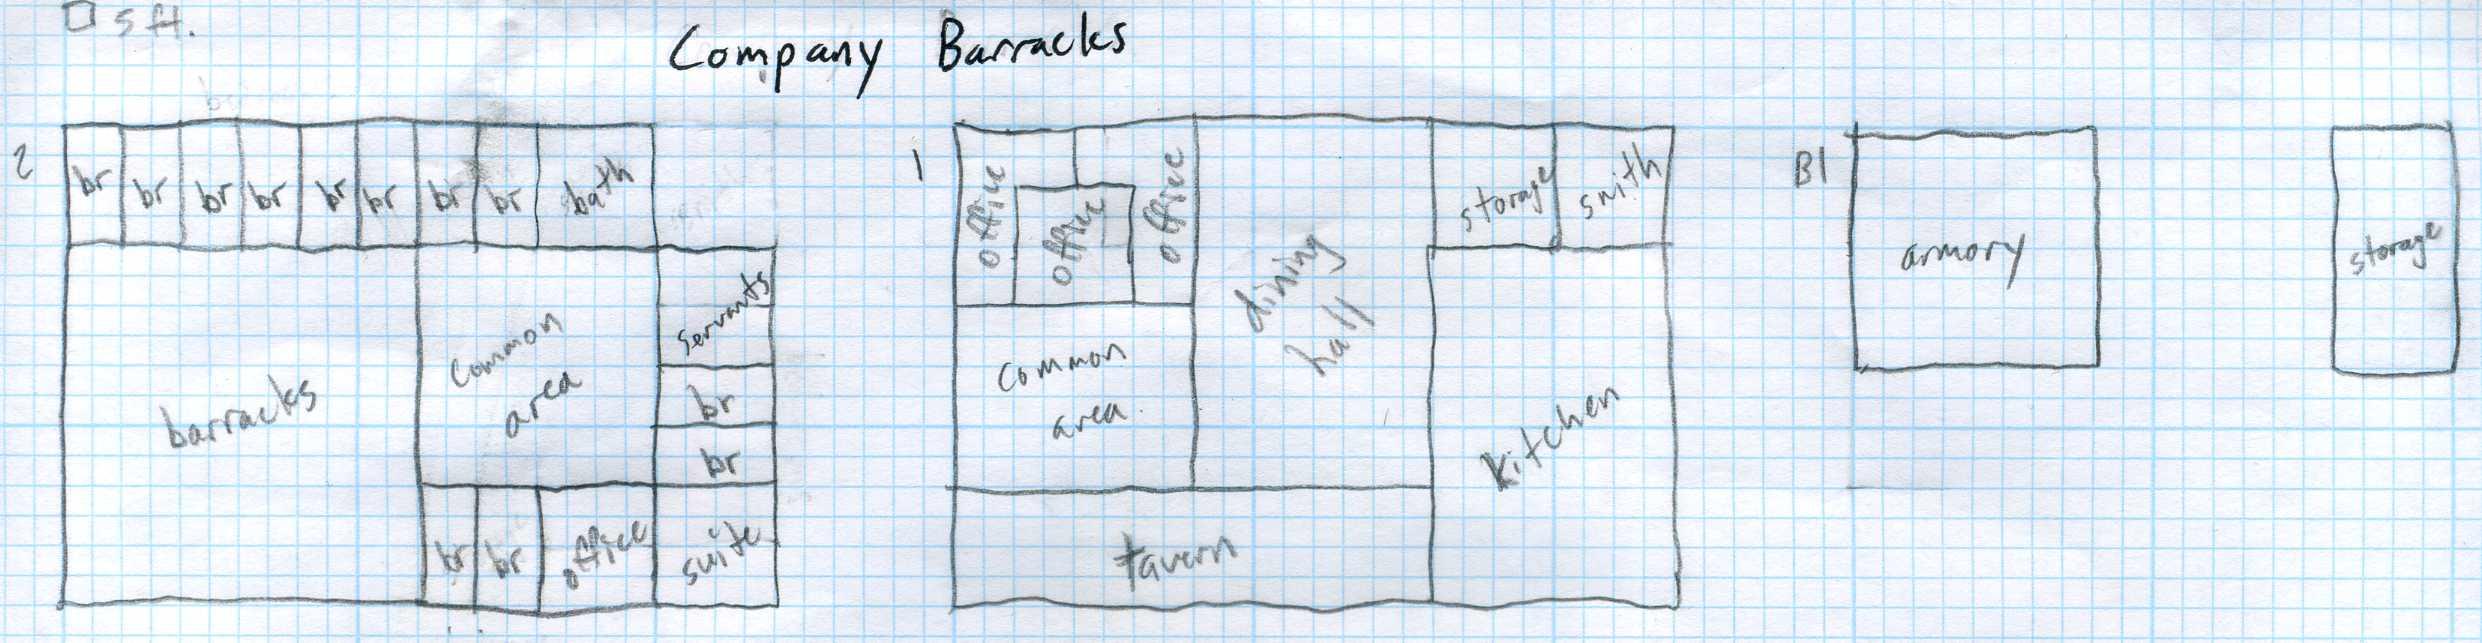 Diamond_Fortress_-_Company_Barracks.jpg